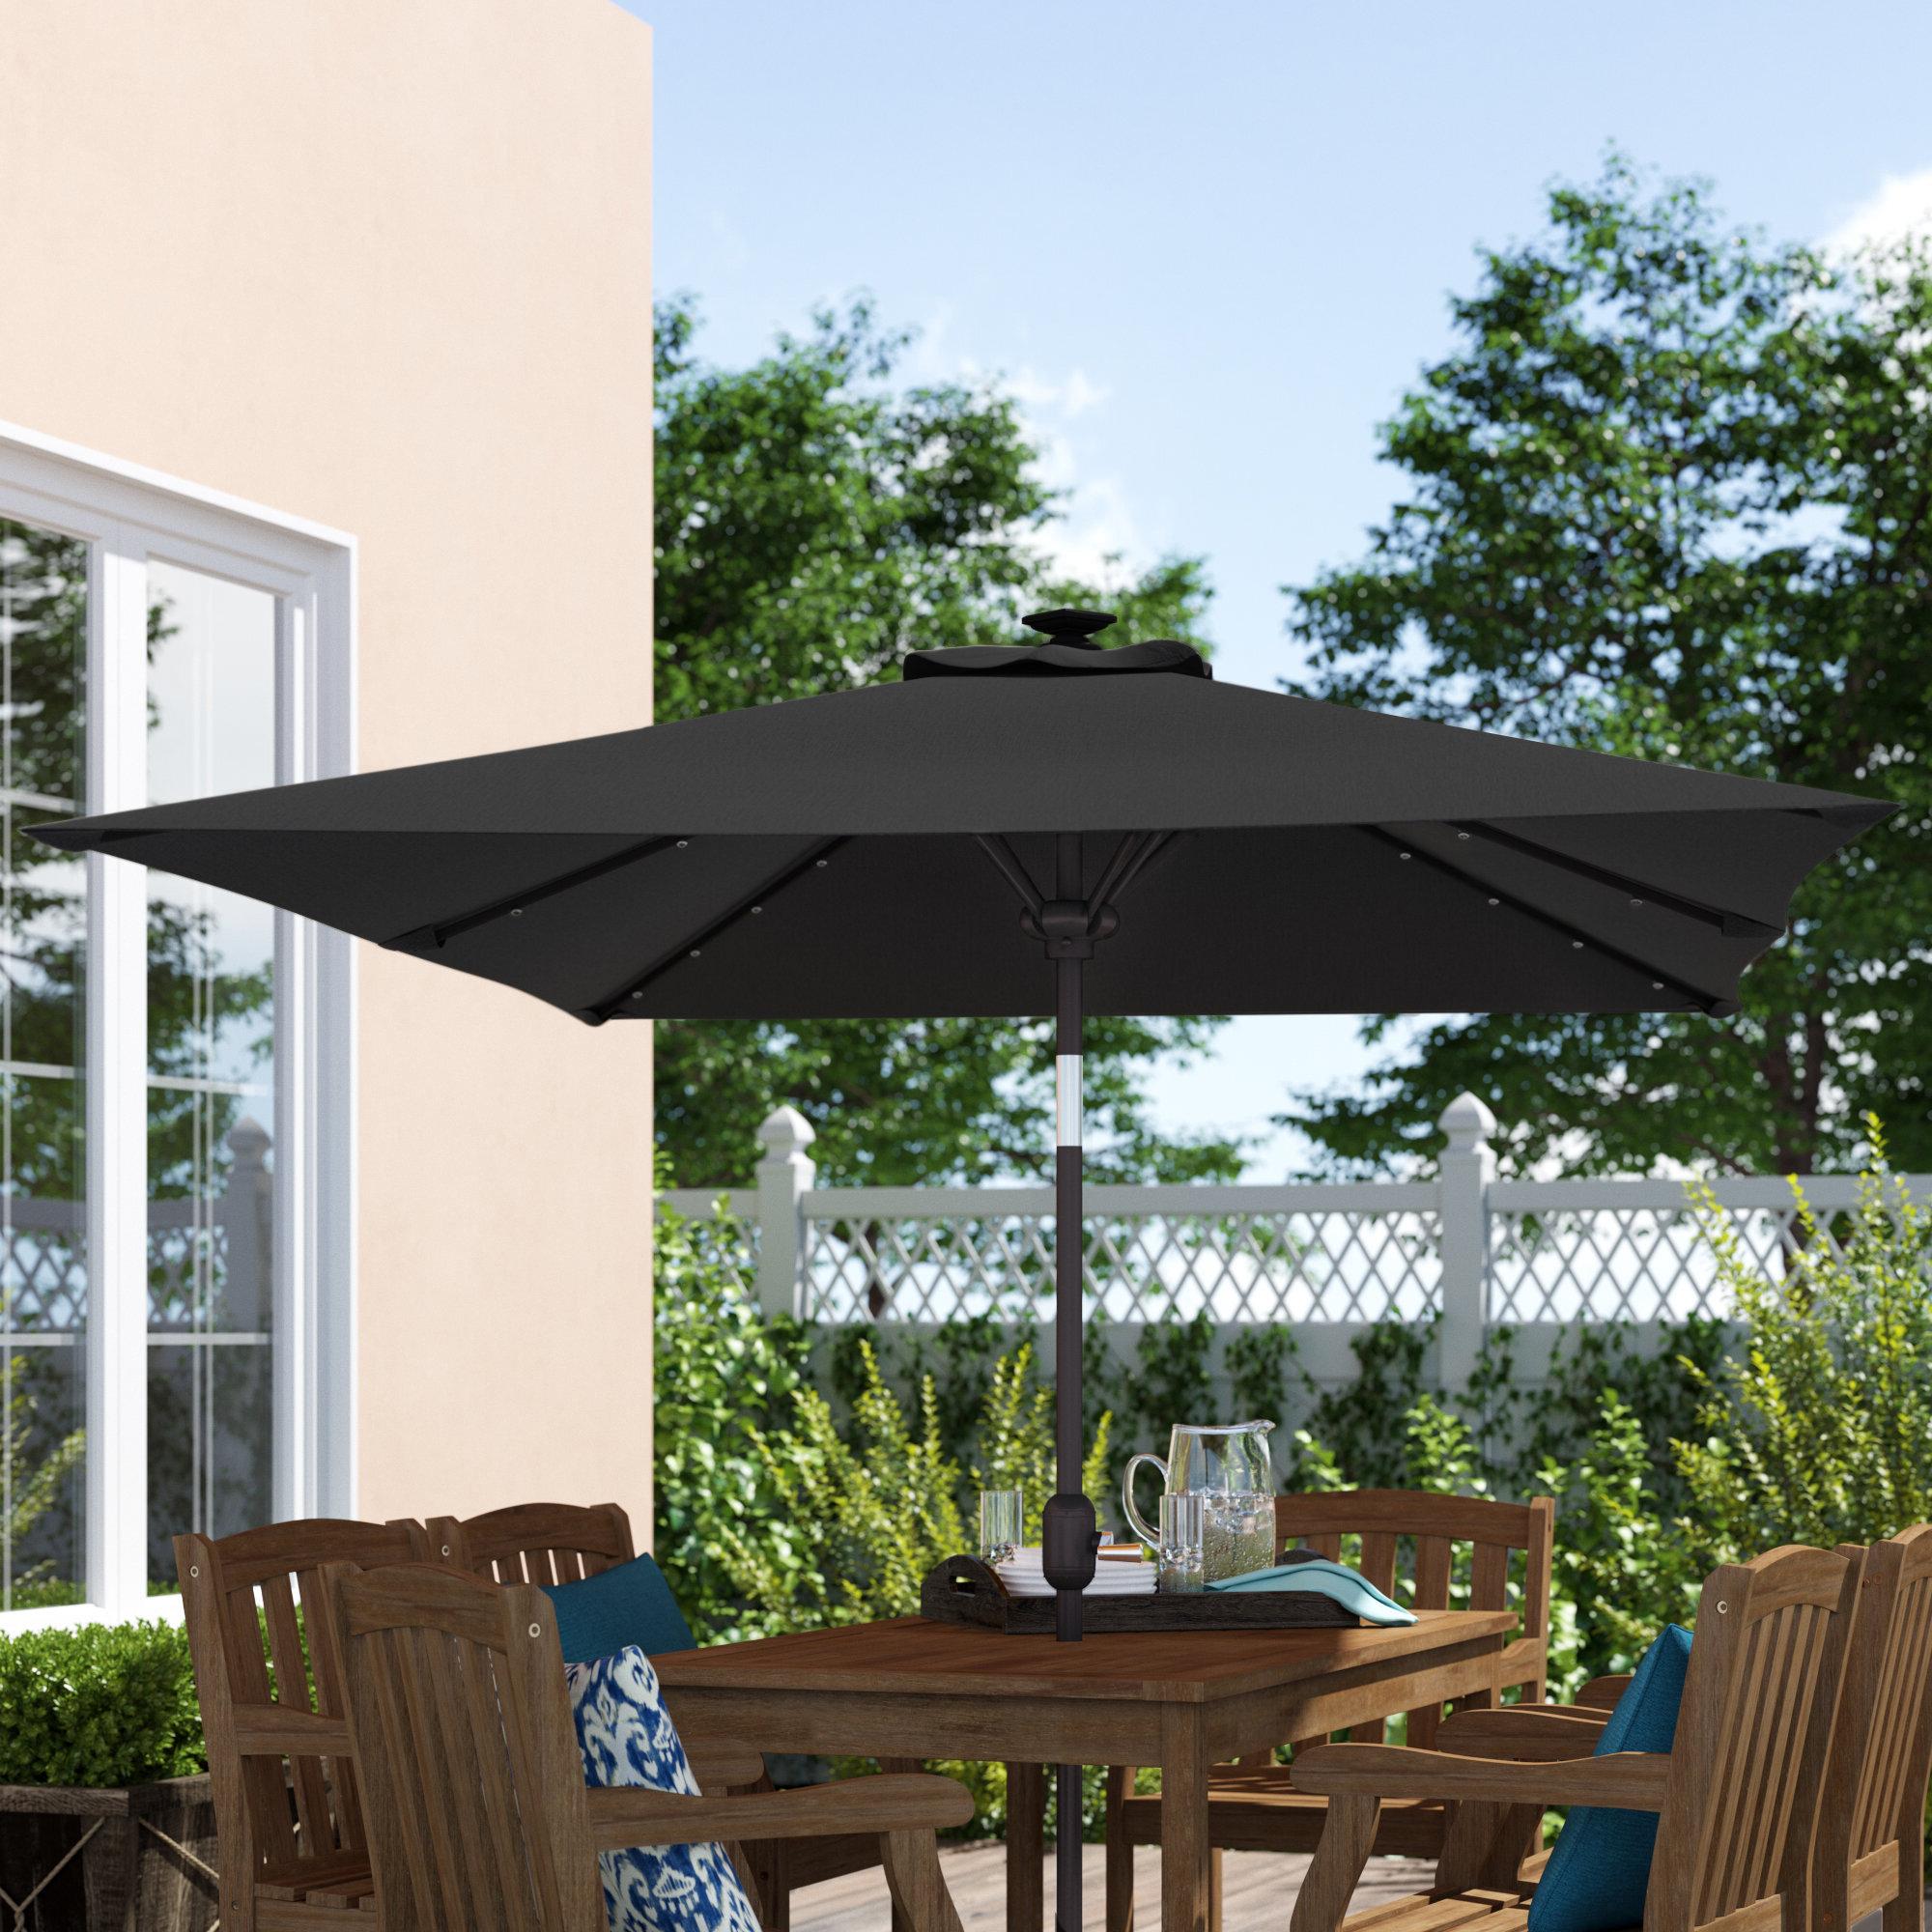 "2019 Gries Rectangular Market Umbrellas Inside Eliana Solar Lighted Sunshade Tilt Crank 10' X 6'6"" Rectangular Market  Umbrella (Gallery 11 of 20)"